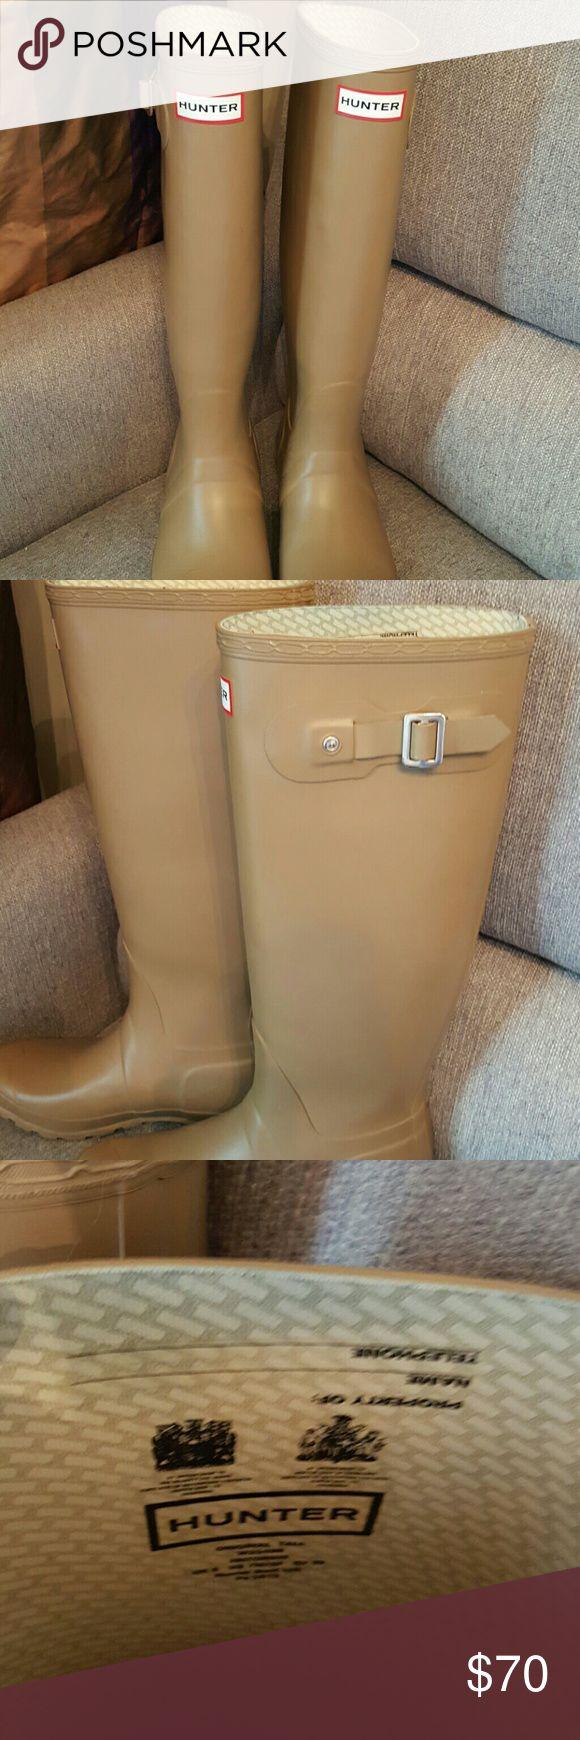 Womens Hunter boots, size 7 Khaki tall size 7. Worn maybe 3 times. Hunter Boots Shoes Winter & Rain Boots